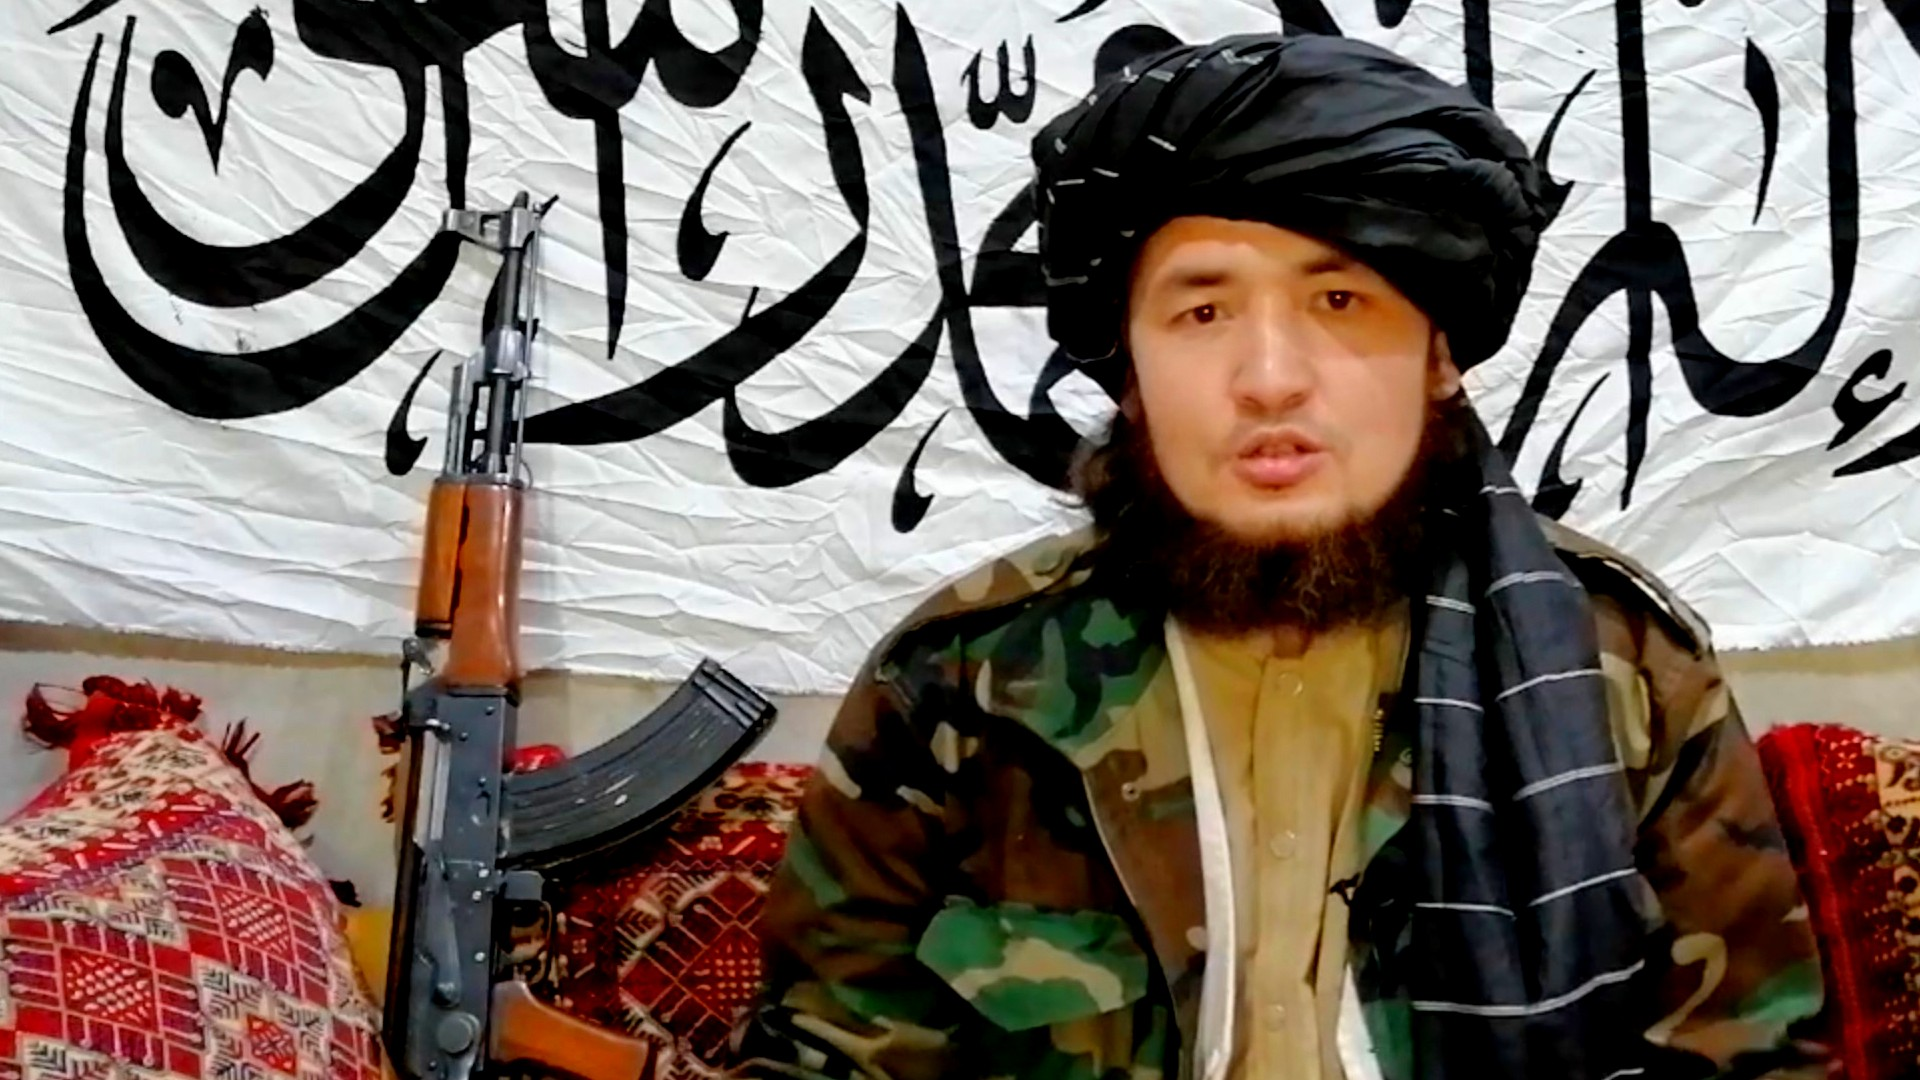 Maulana Mahdi arbeitet und kämpft nun für die Taliban.